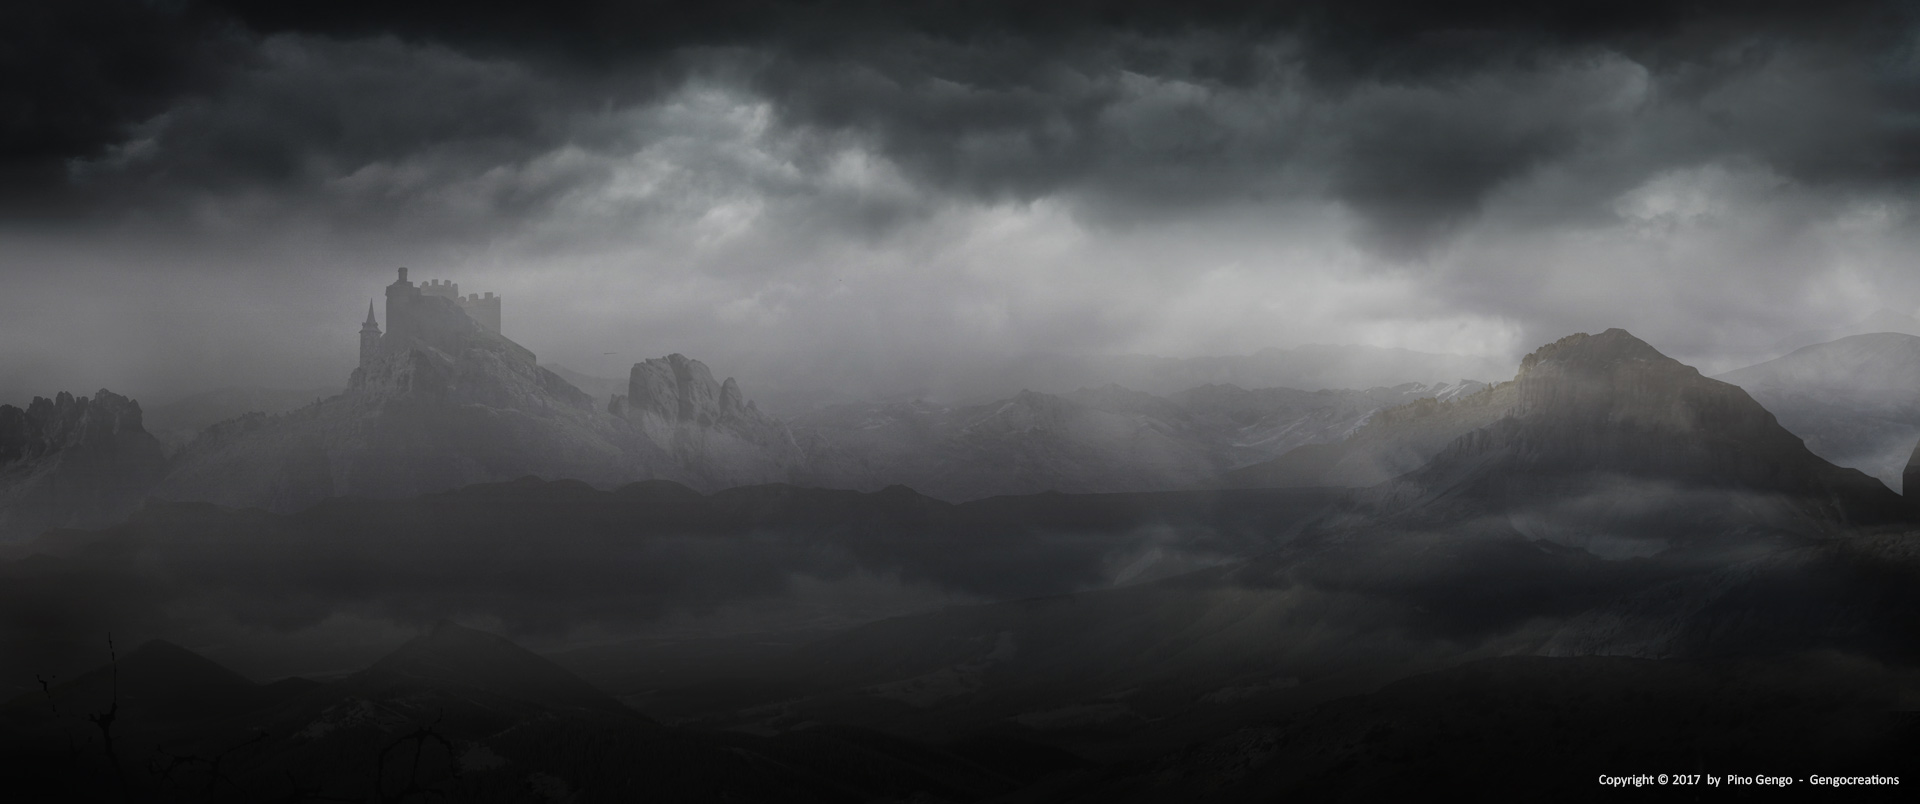 Pino Gengo: Dark Landscape - Matte Painting